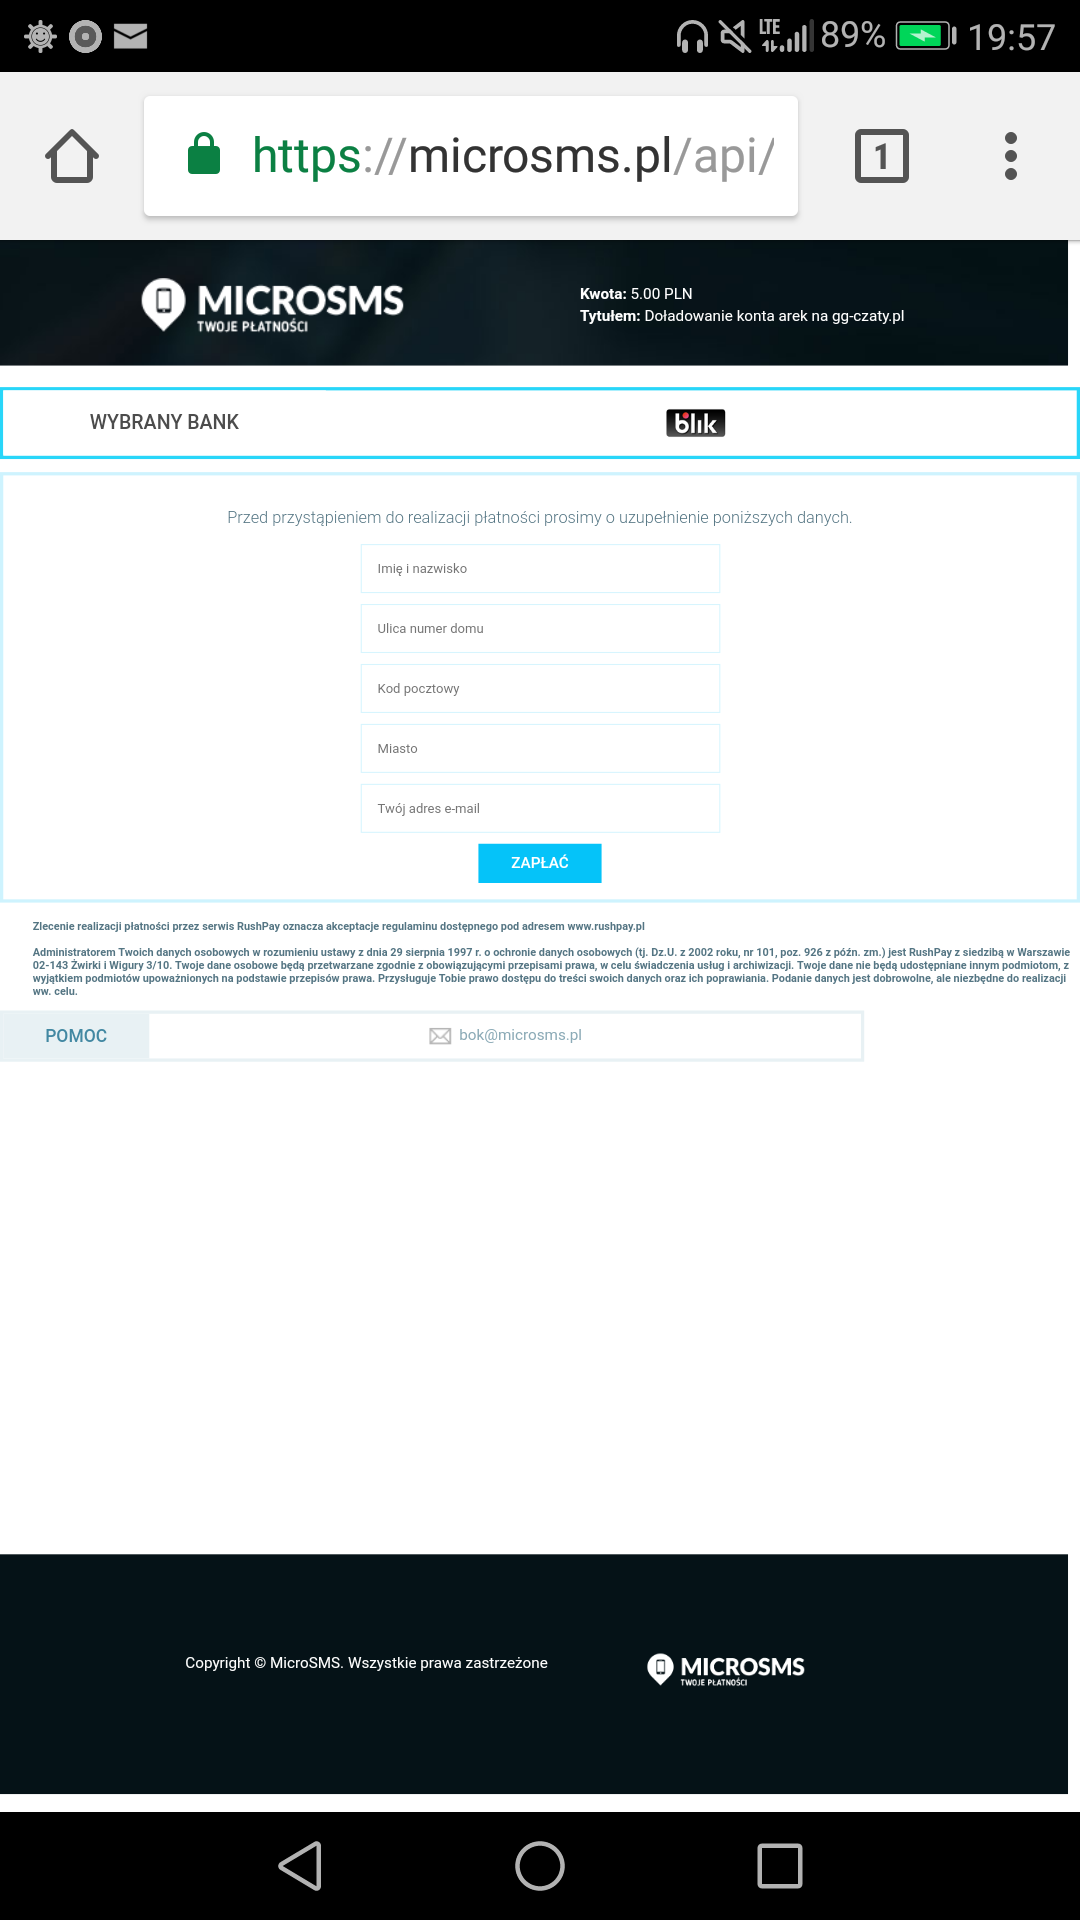 Screenshot_20180211-195722.png